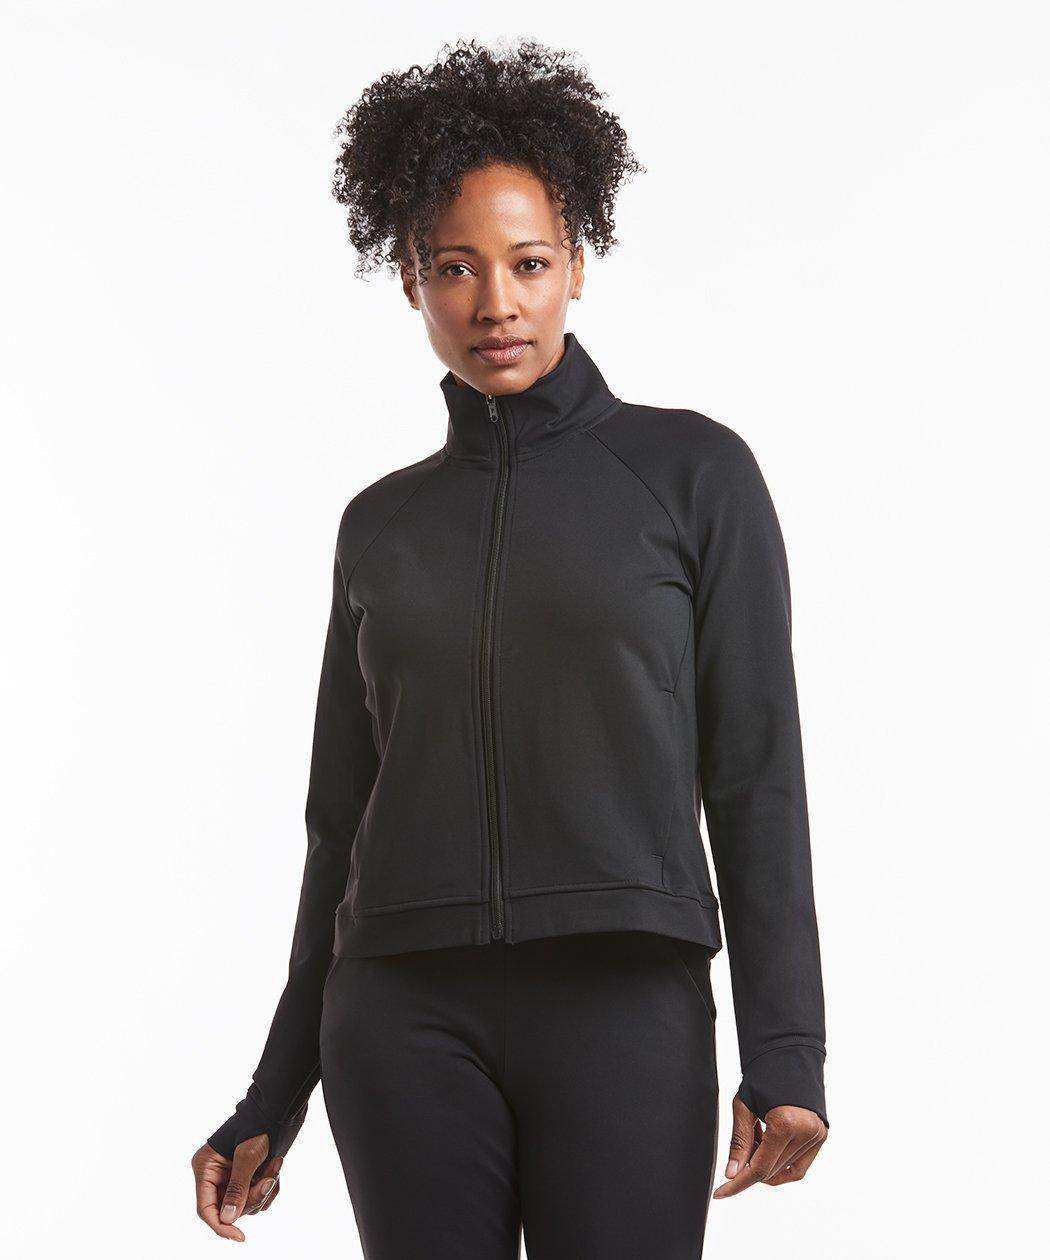 Apparelmark portfolio, featuring athleisure for women